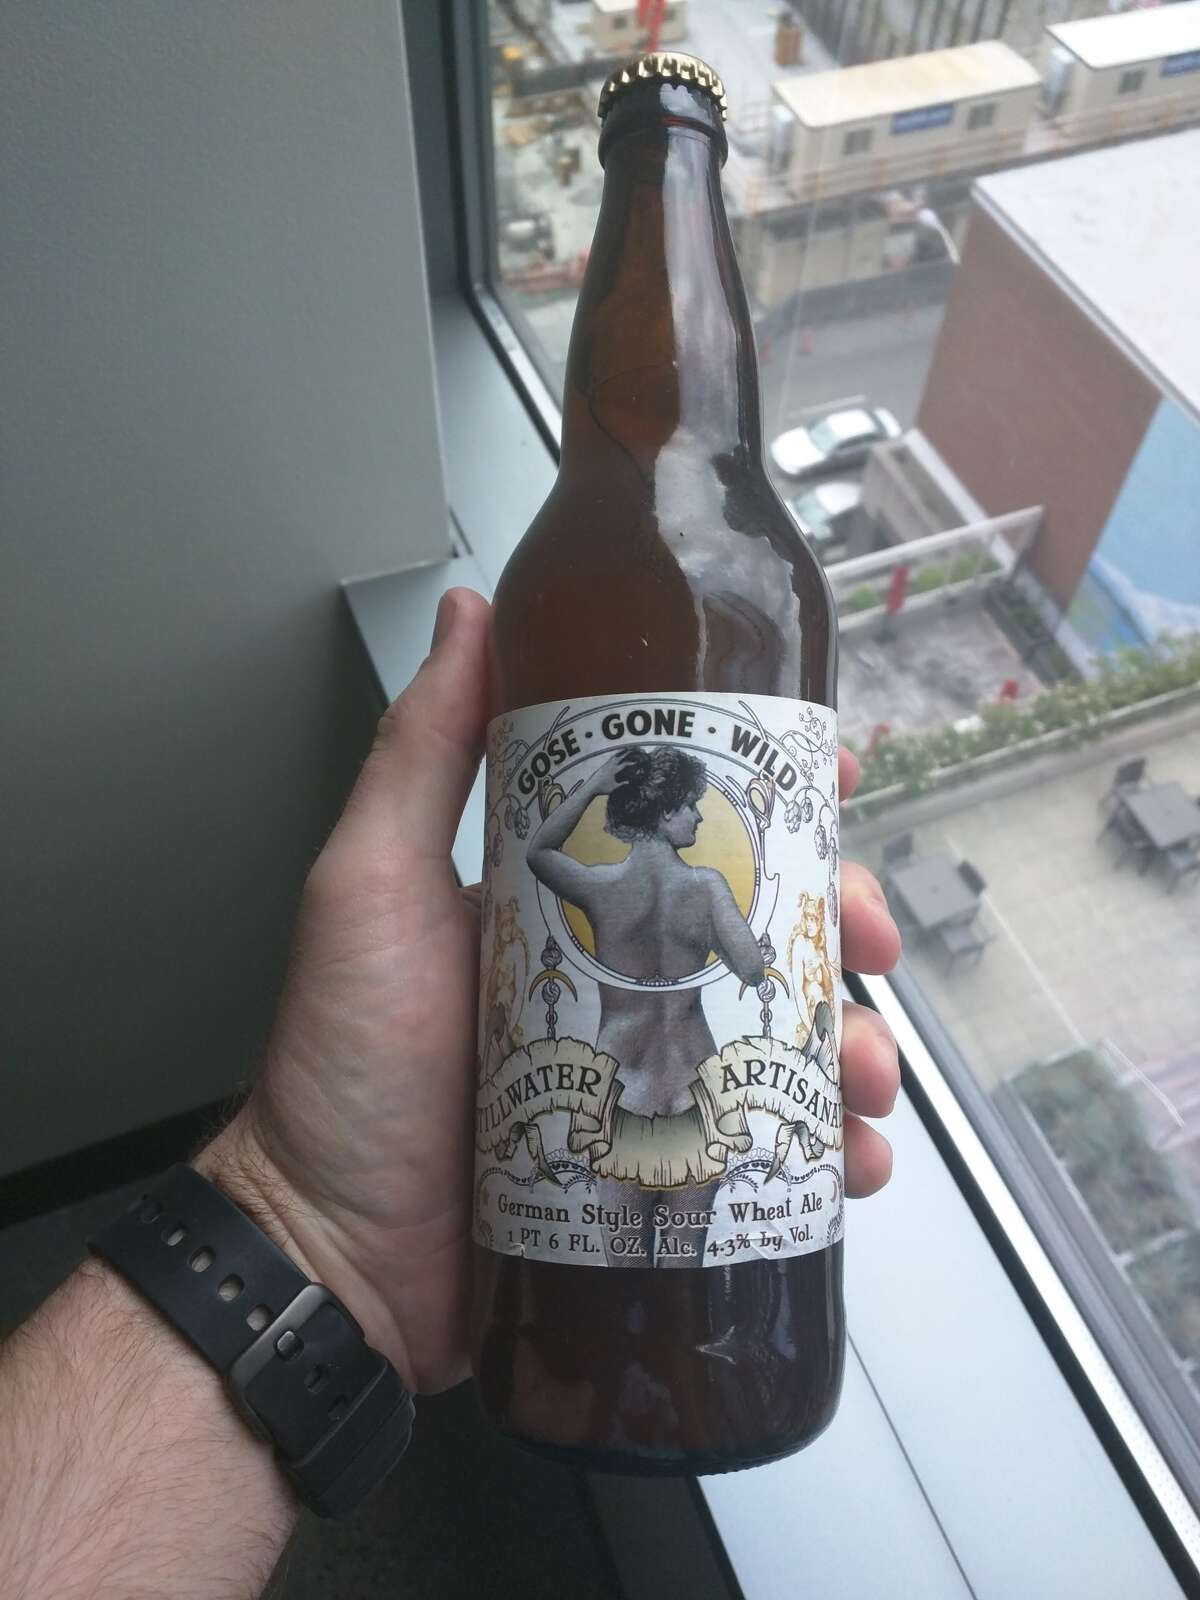 Maryland Gose Gone Wild - German-style sour wheat ale, Stillwater Artisanal Beer Photo credit: